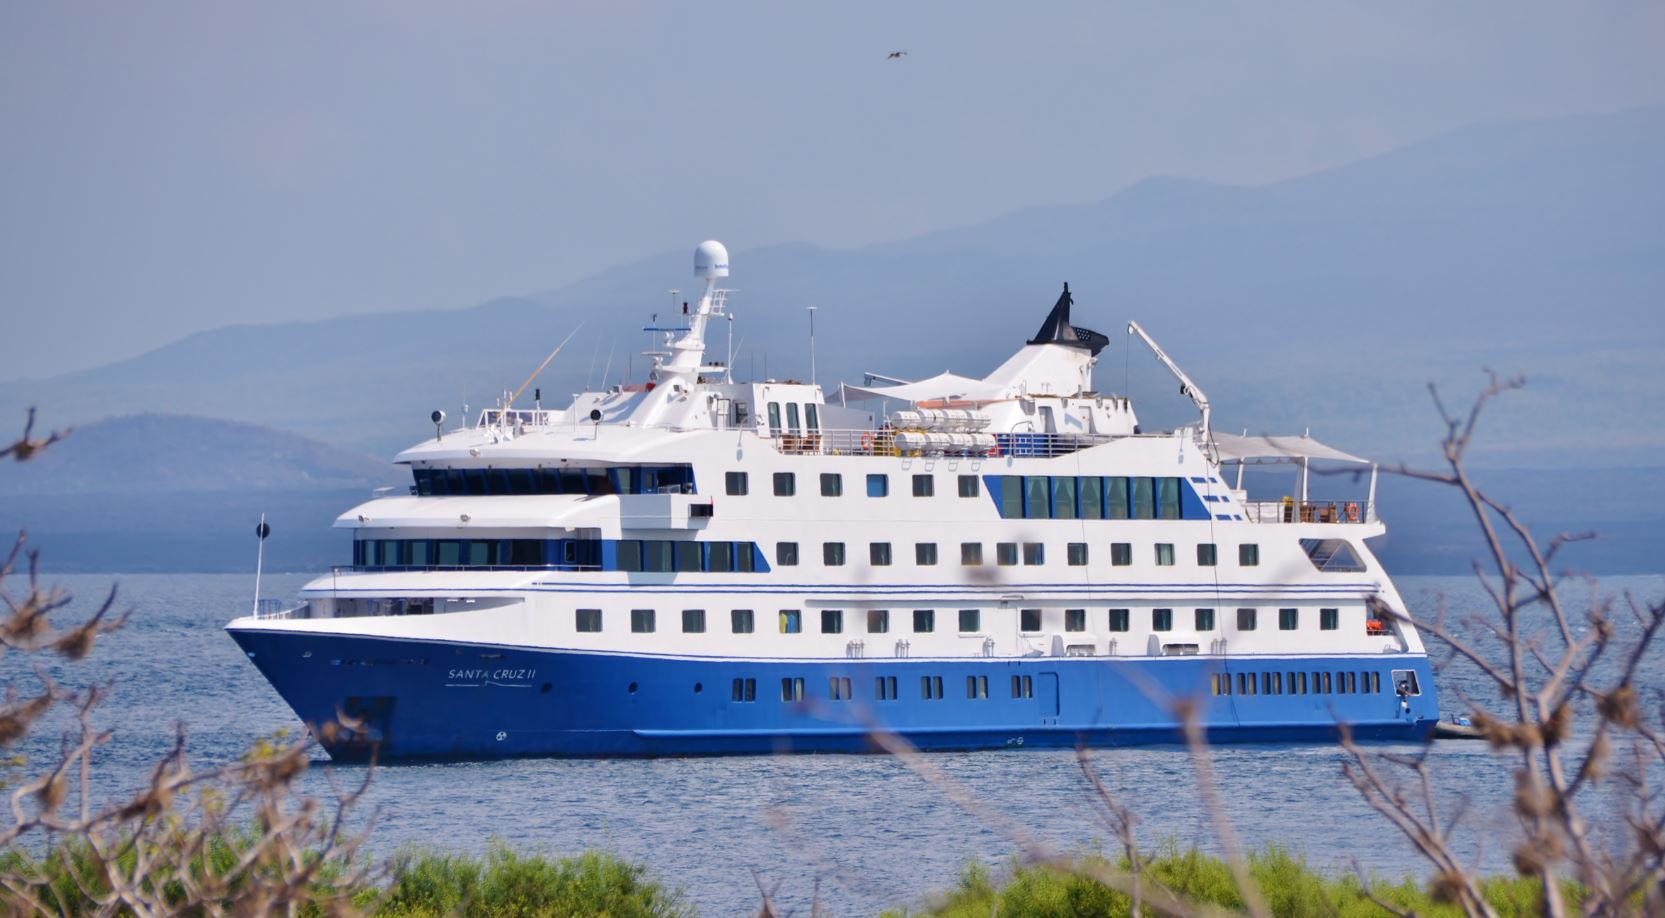 Galapagos Cruise Santa Cruz II.